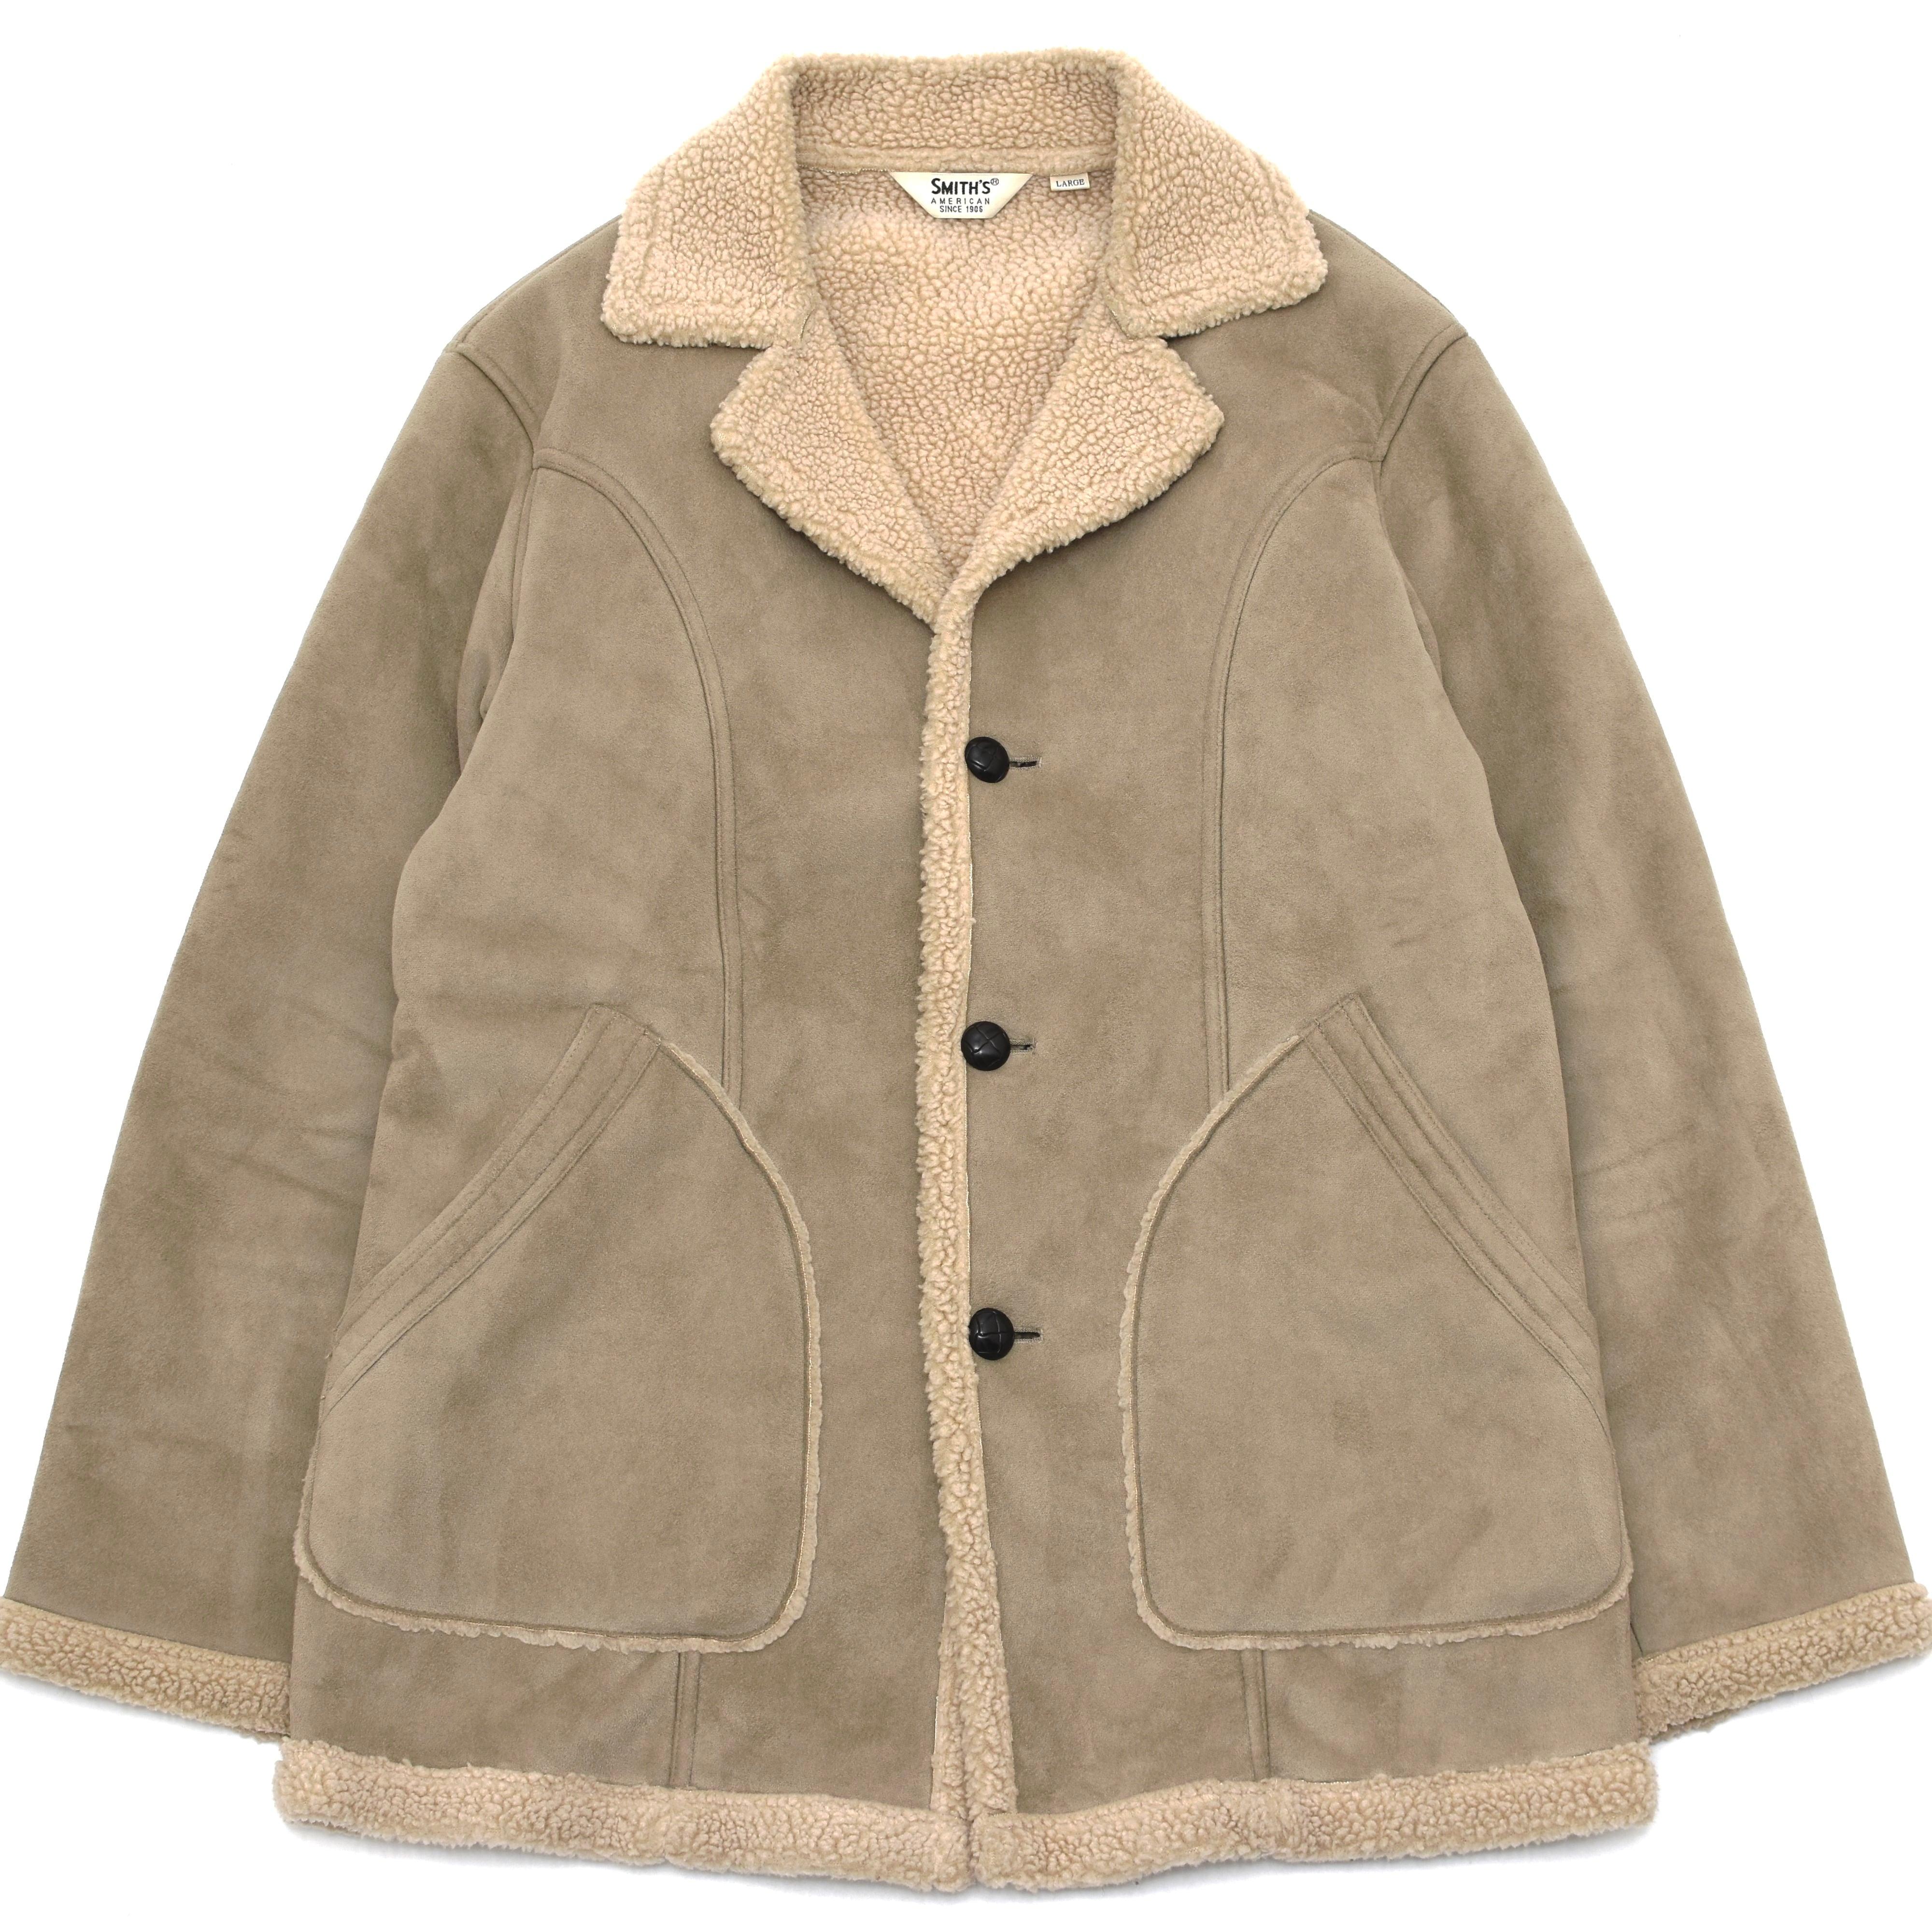 Smith's American Fake Mouton coat